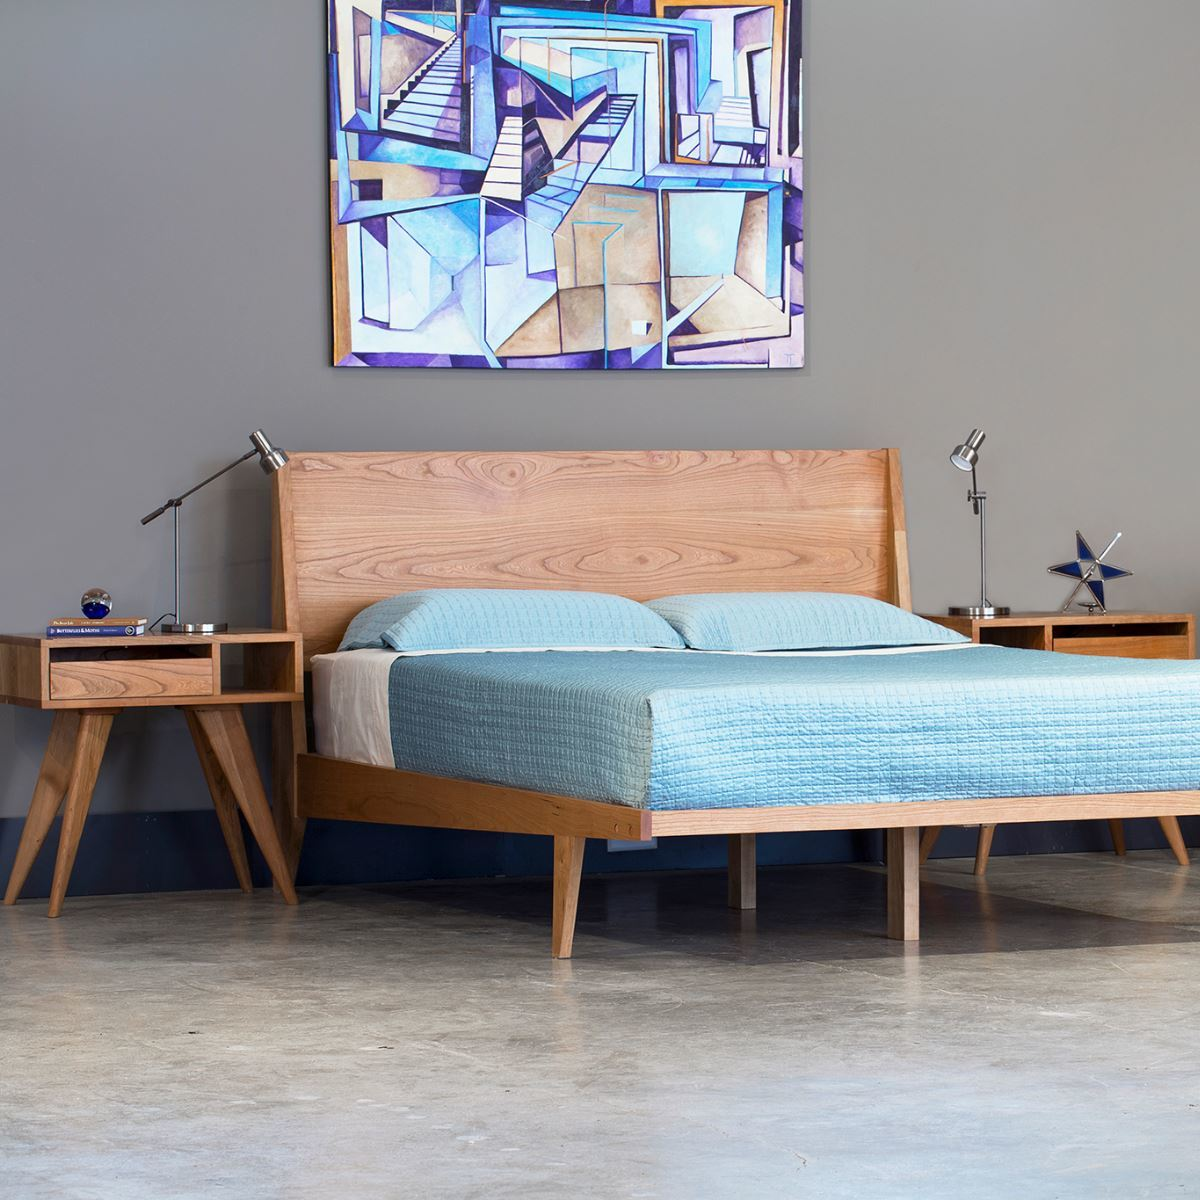 TY Fine Furniture – Latex Mattress Store Columbus Ohio.